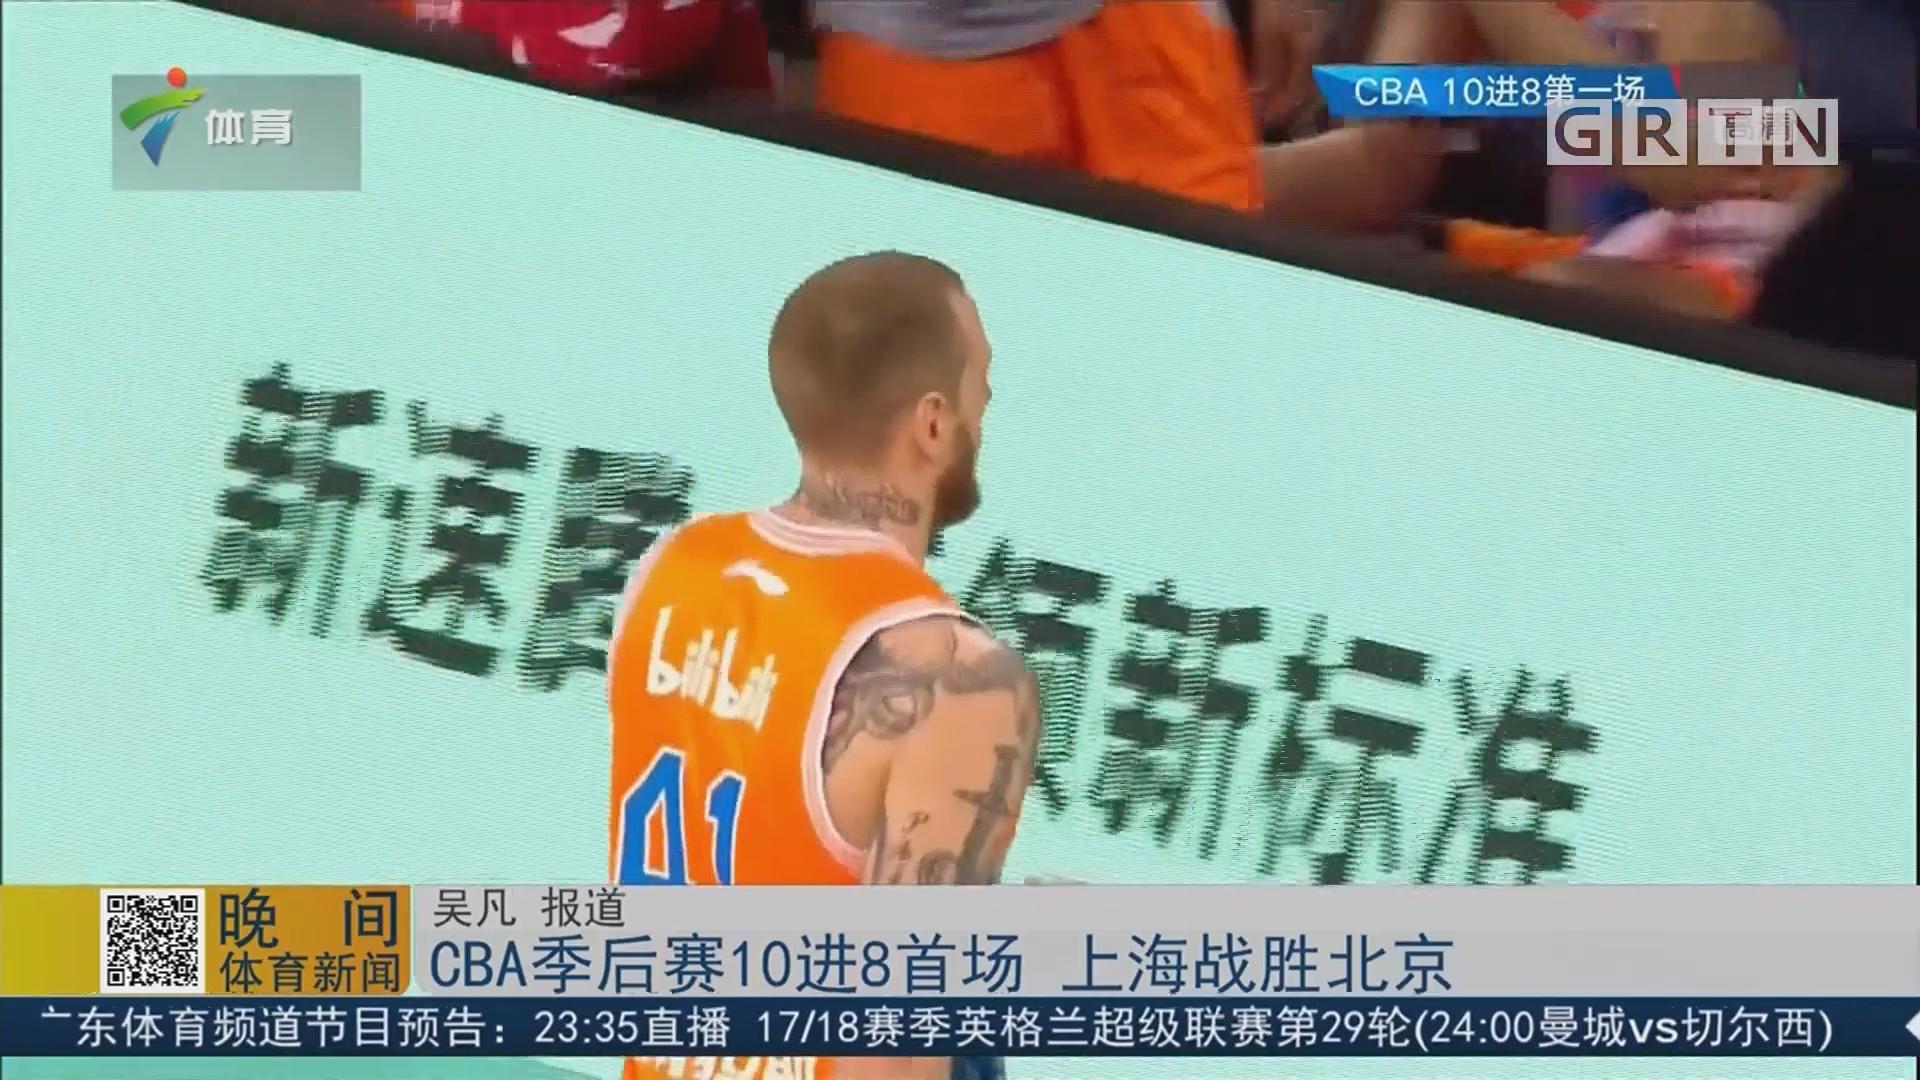 CBA季后赛10进8首场 上海站胜北京